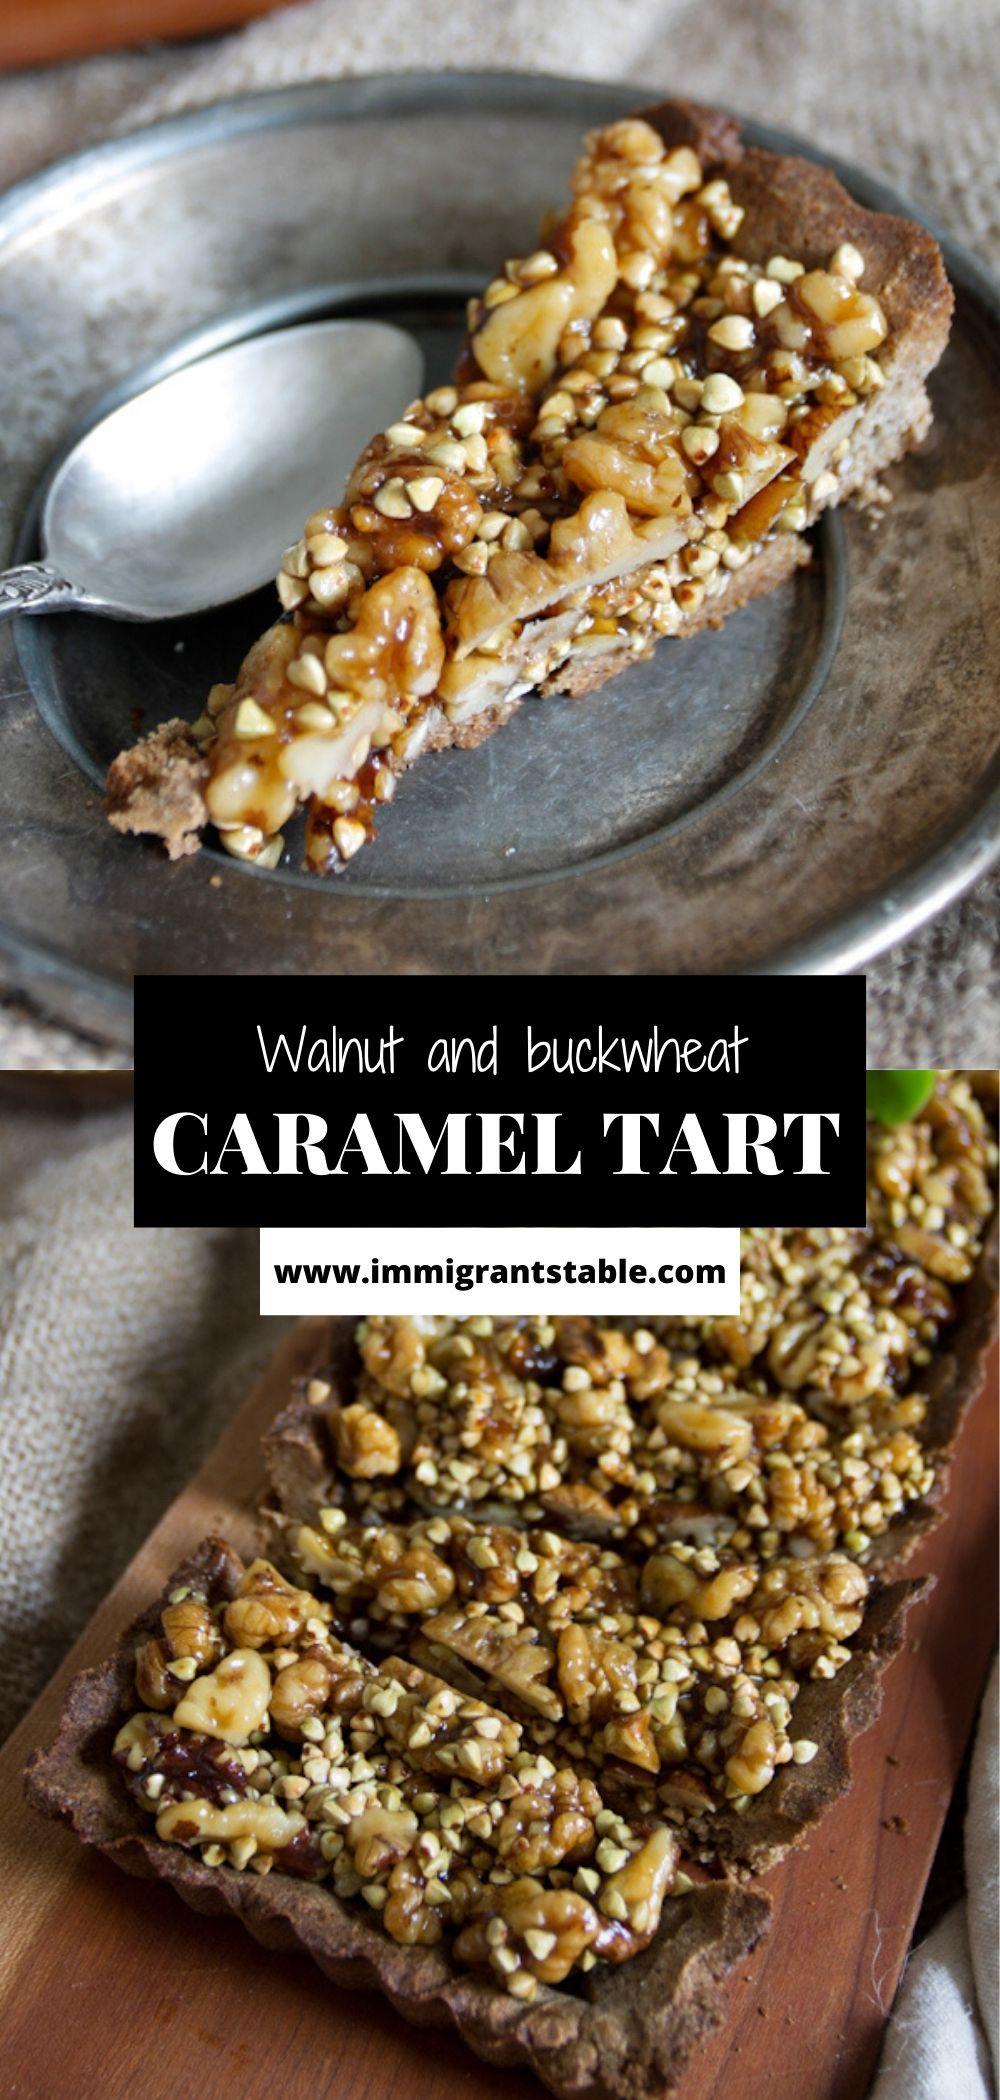 At The Immigrant S Table Walnut And Buckwheat Caramel Tart Recipe Caramel Tart Dessert Recipes Easy Sweet And Salty